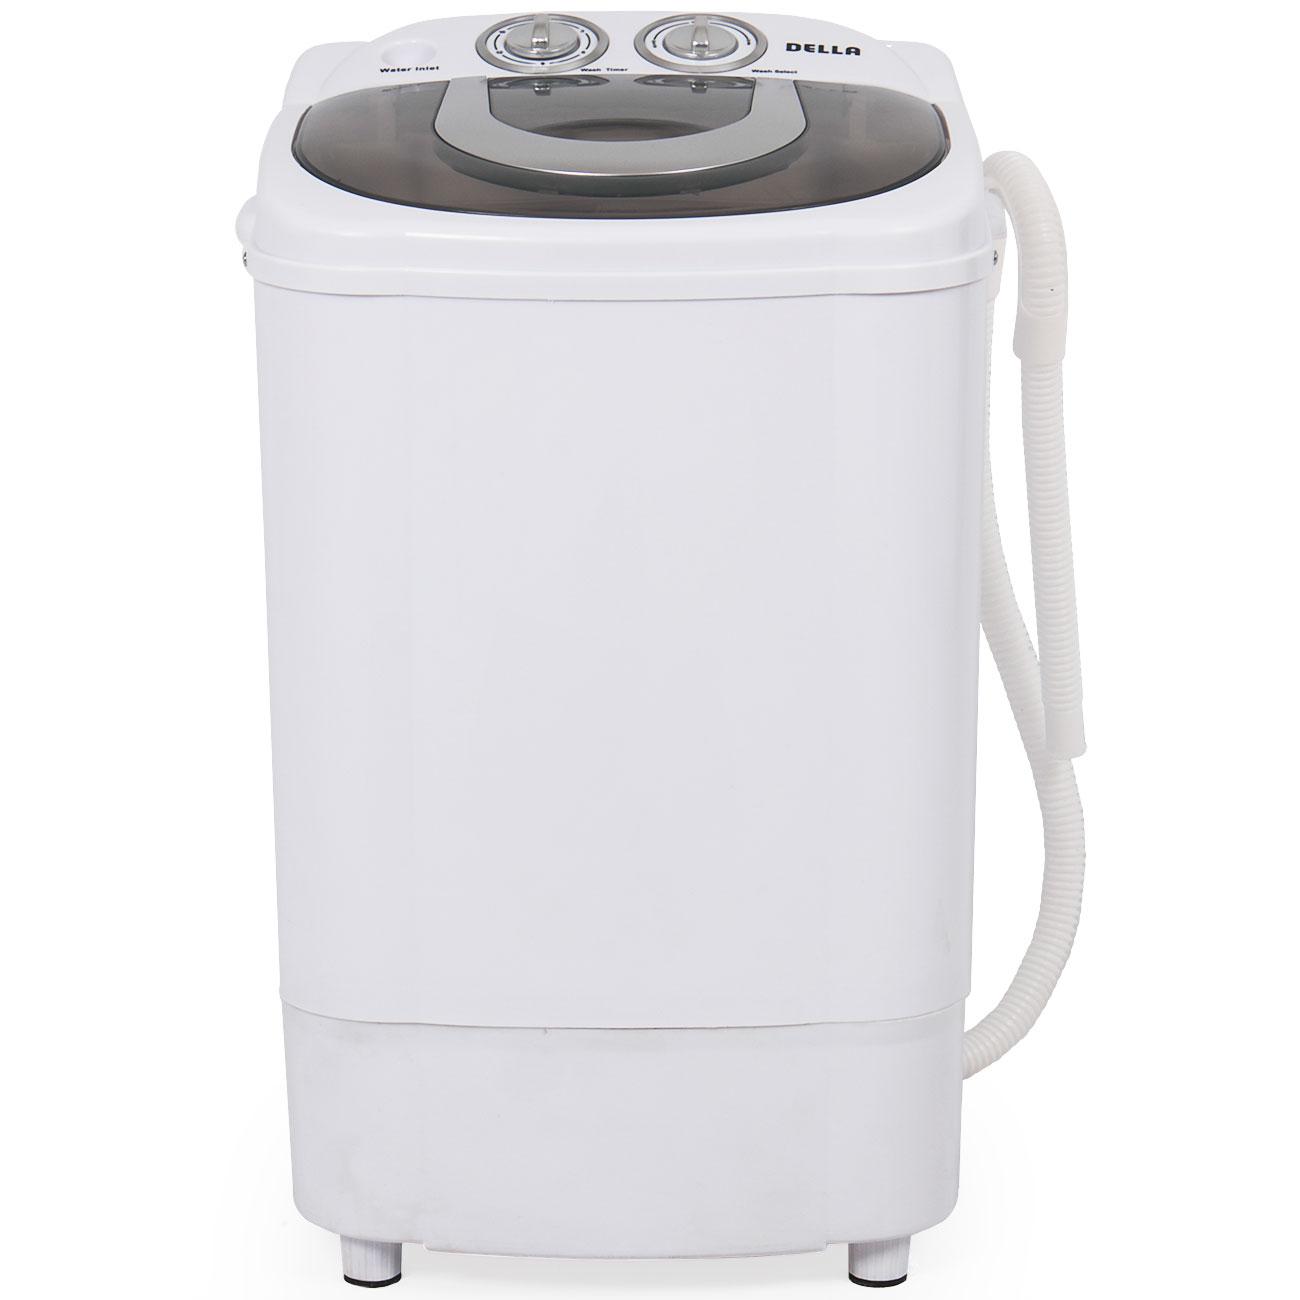 Electric Small Mini Portable Compact Washer Washing